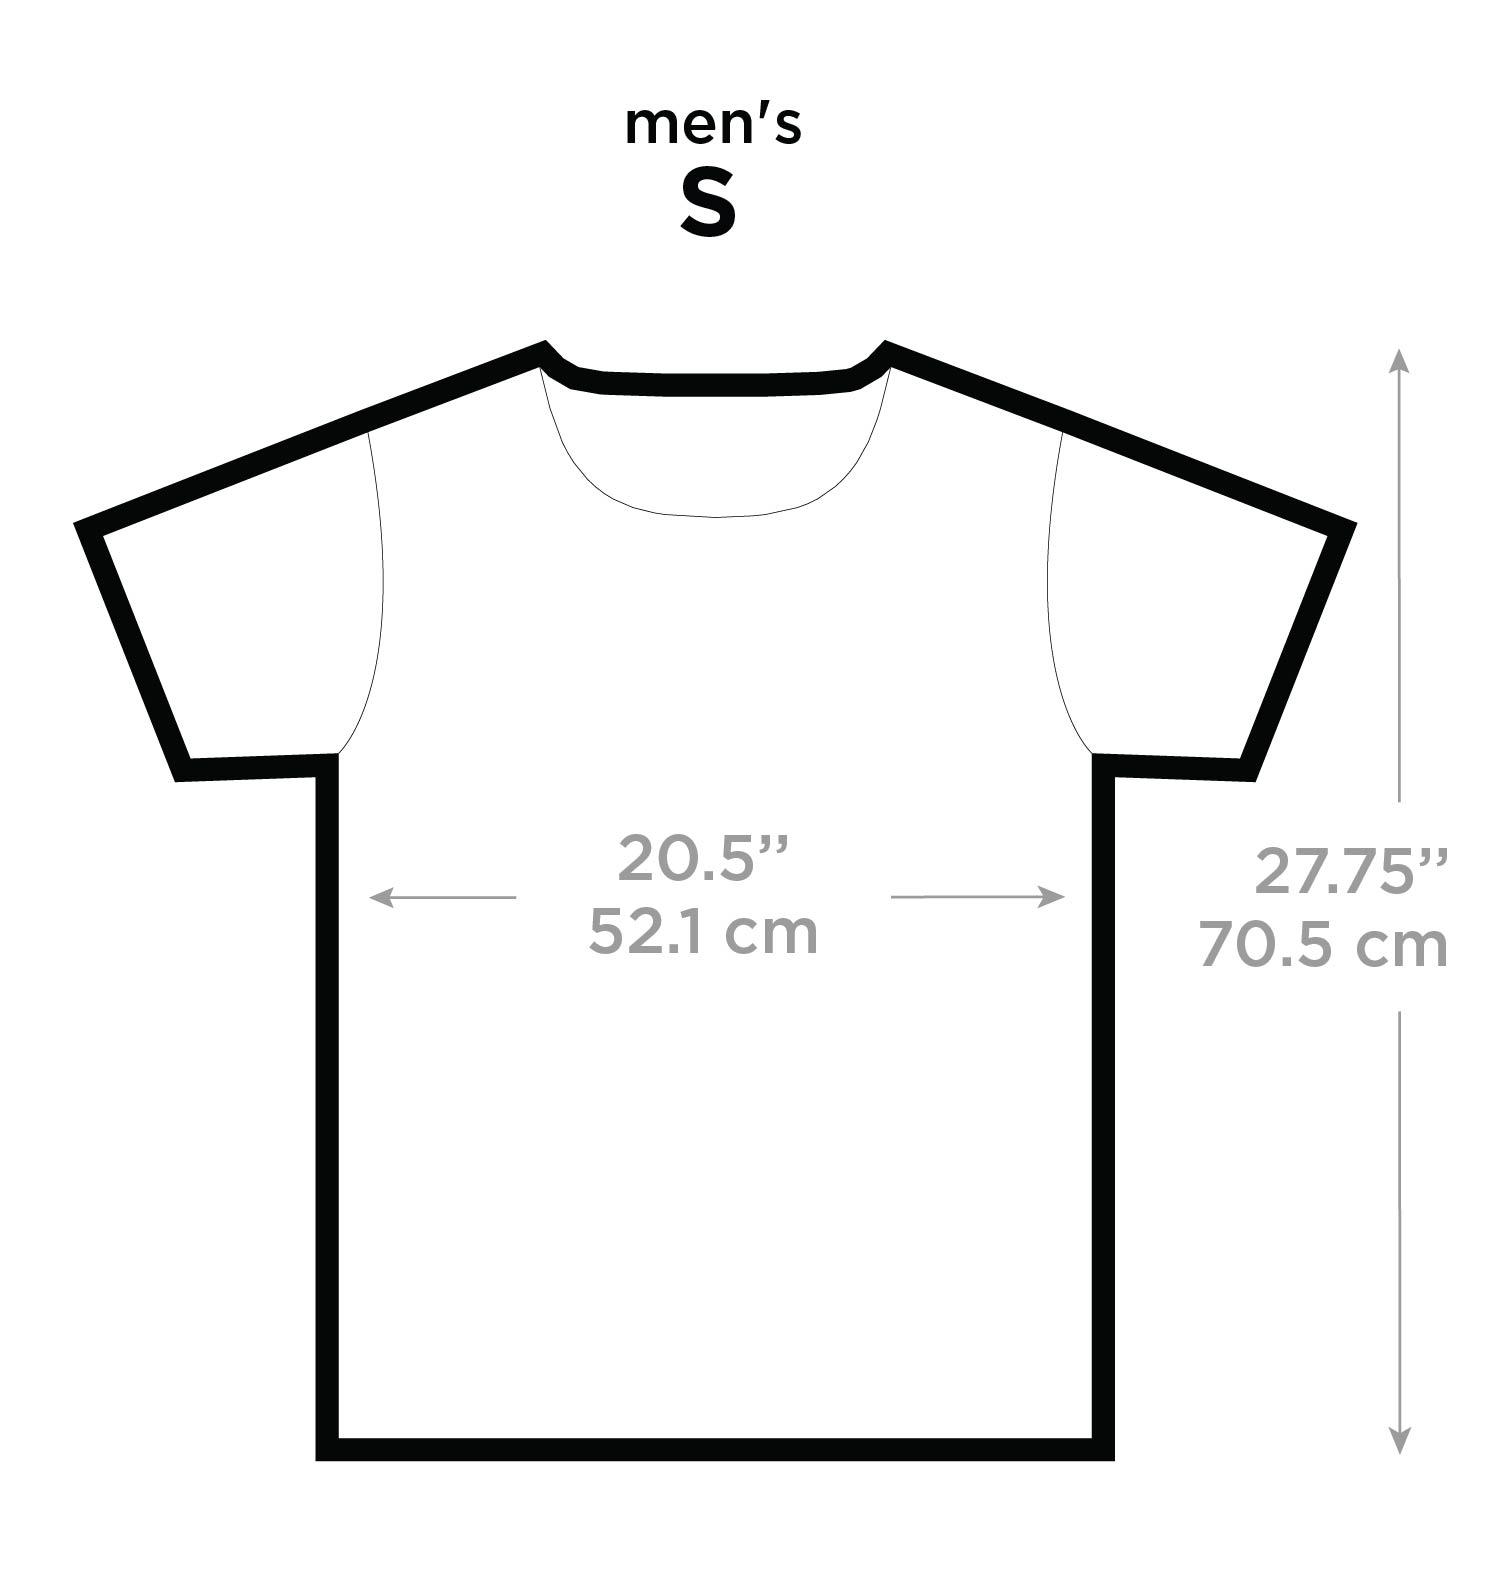 tshirt_men_s size chart t shirt men picture this clothing